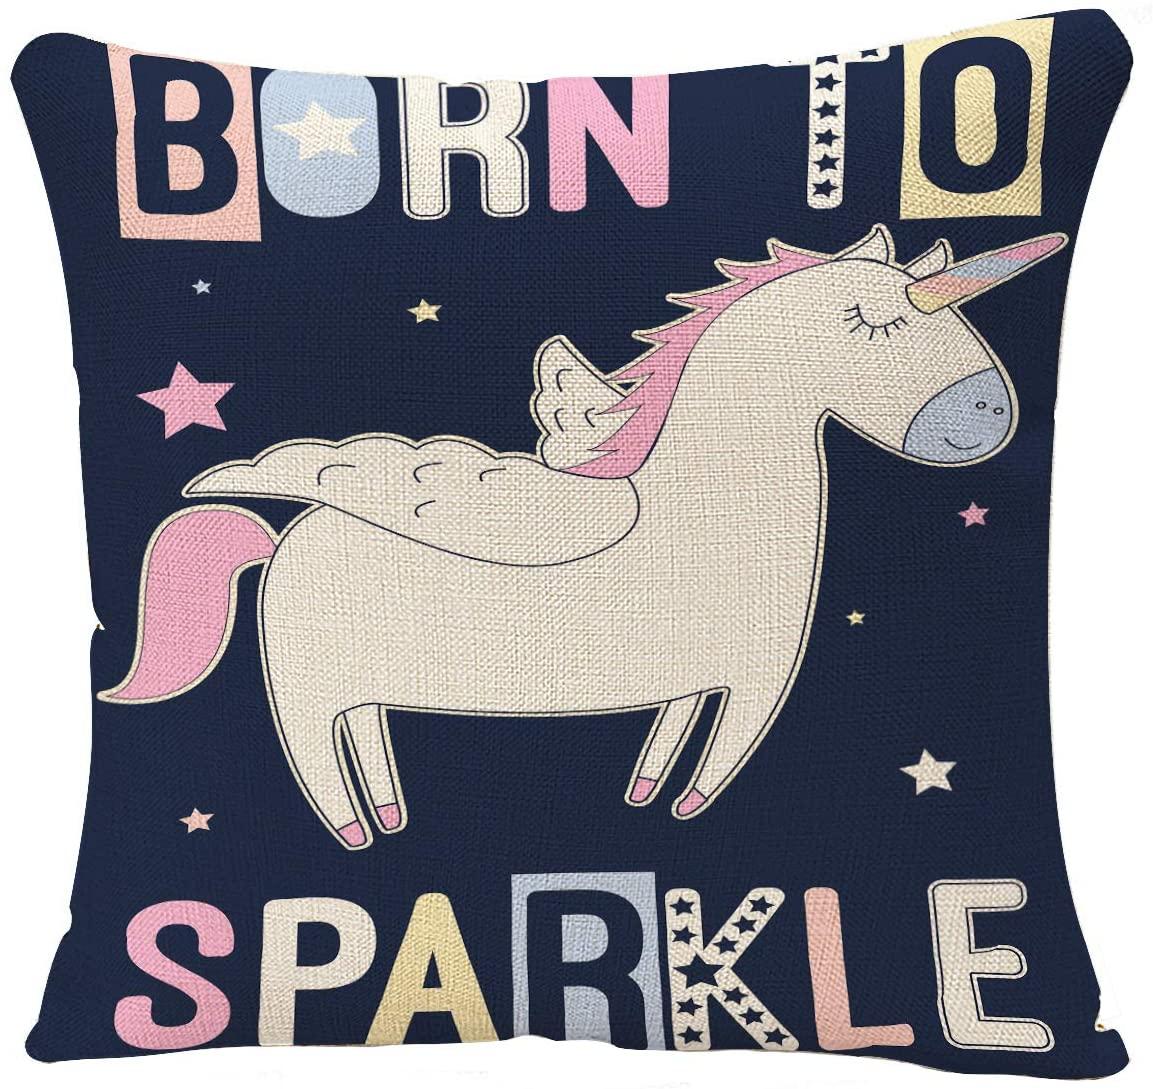 YGGQF Unicorn Throw Pillow Cover Born to Sparkle Animal Shine Slogan Cartoon Horse Star Rainbow White Decorative Pillow Cushion Cover Pillowcase 18 x 18 Inch Square Pillow Case